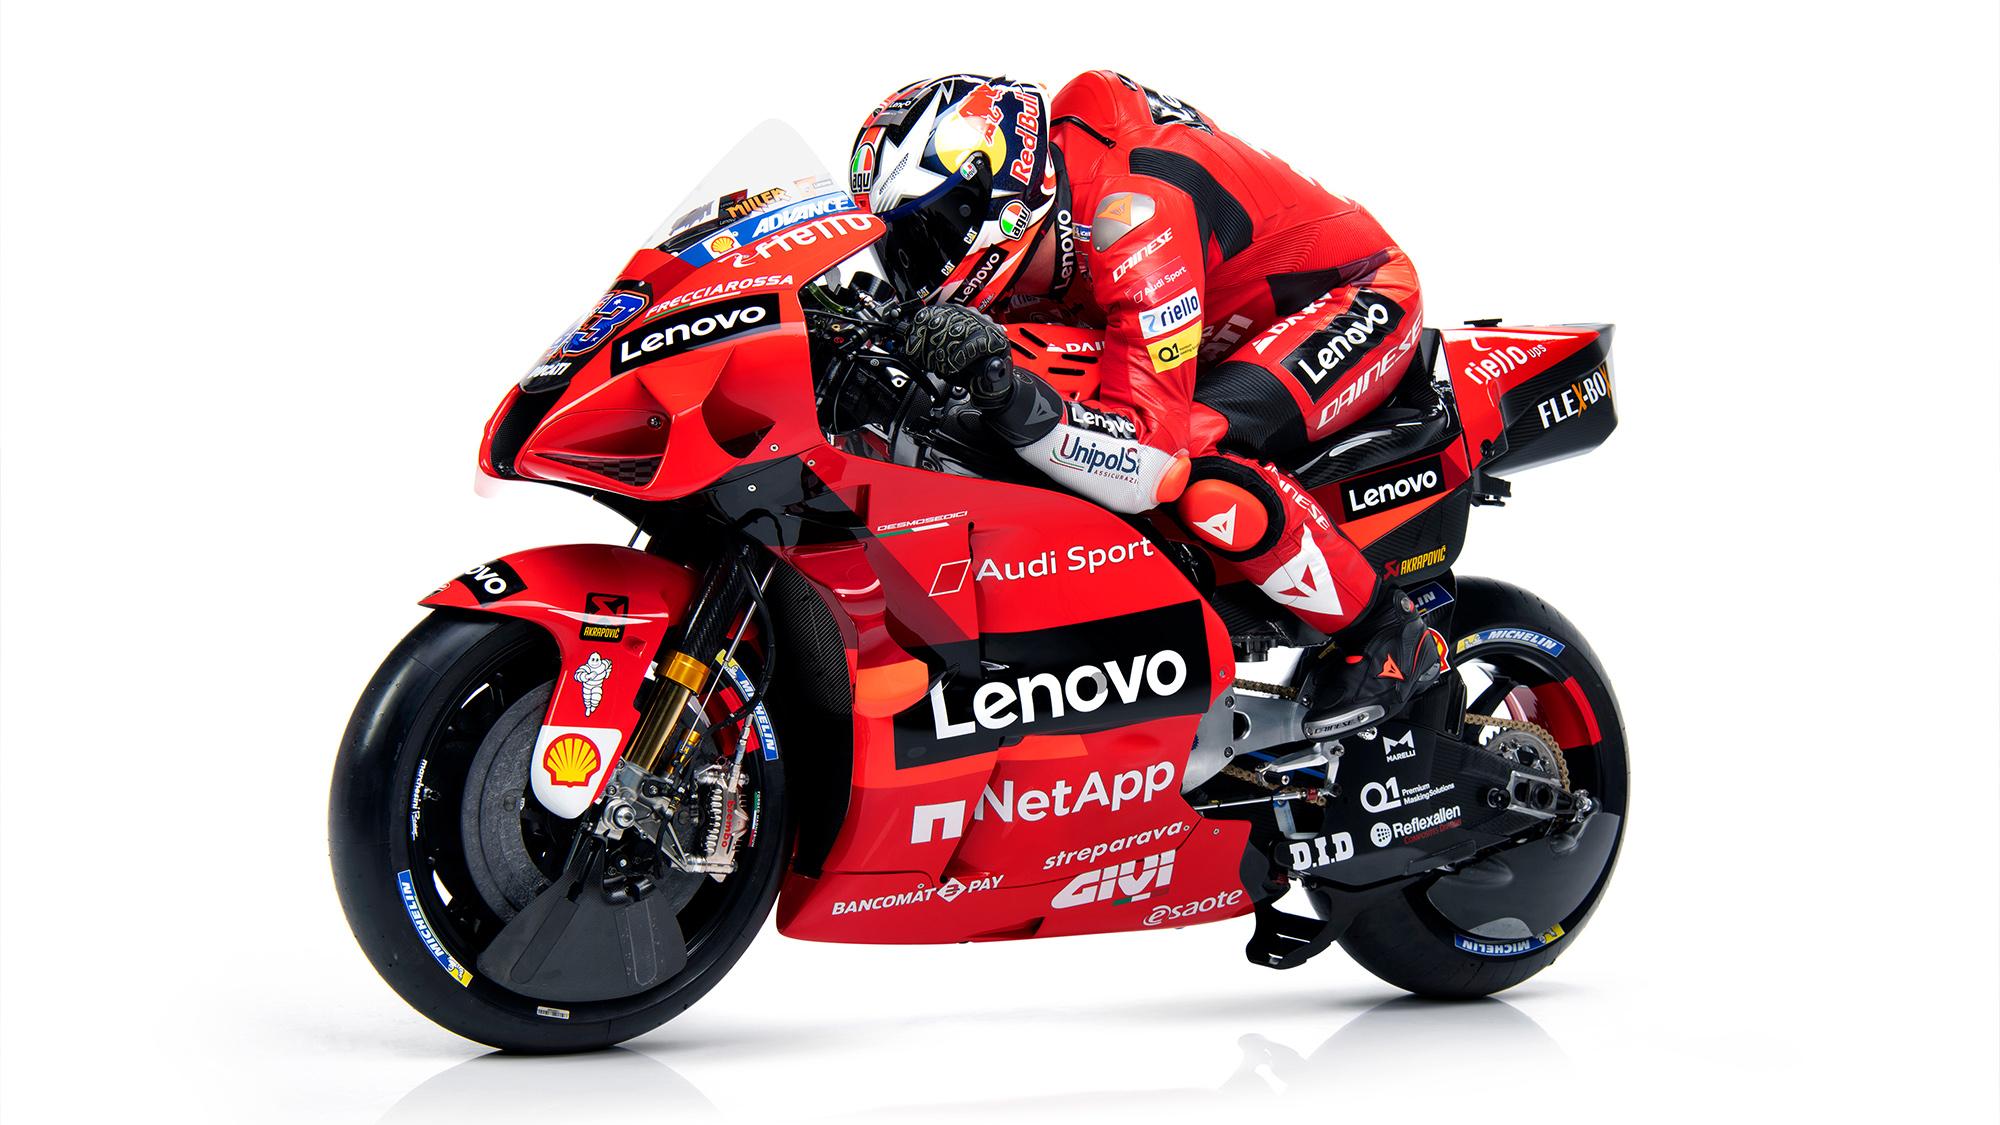 2021 MotoGP Ducati